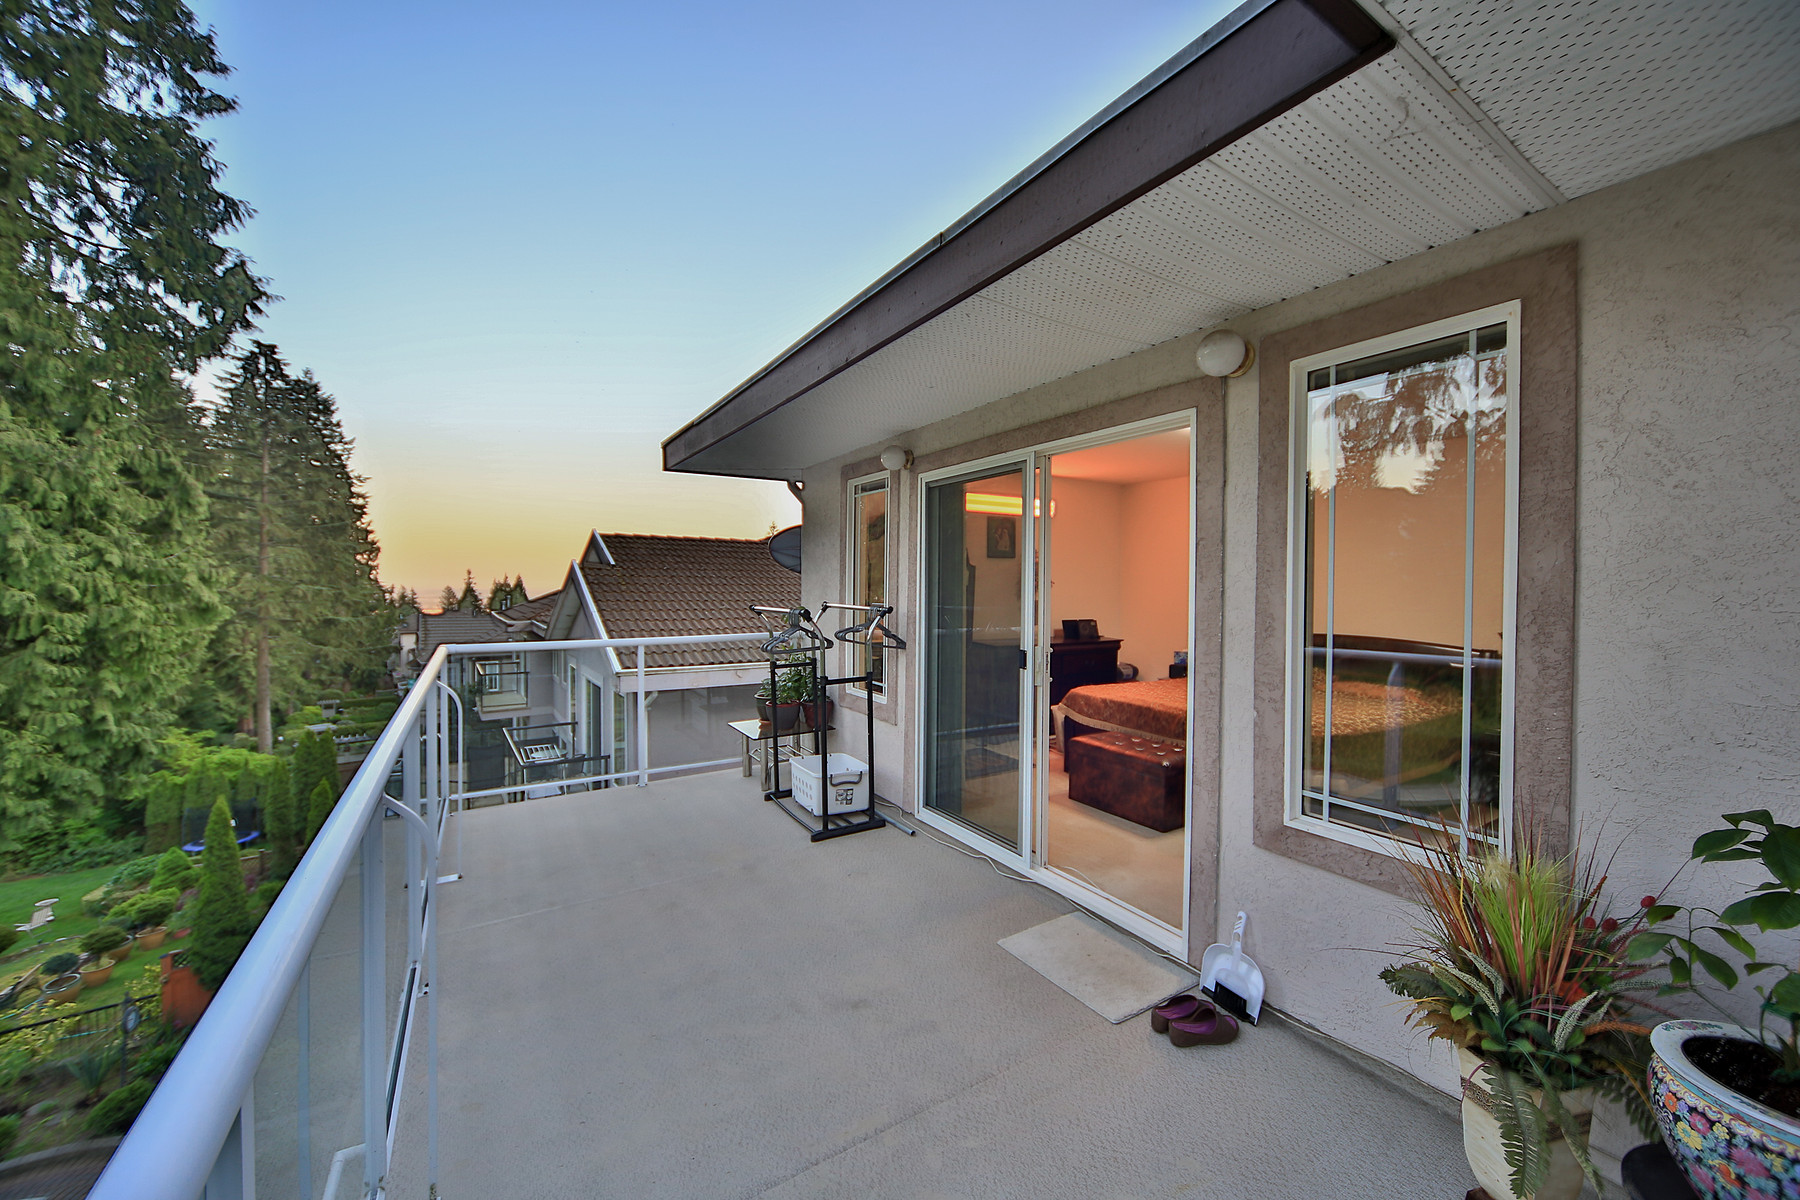 Condominio per Vendita alle ore Coquitlam, Fraser Valley 3319 Plateau Boulevard Coquitlam, Columbia Britannica, V3E 3B8 Canada